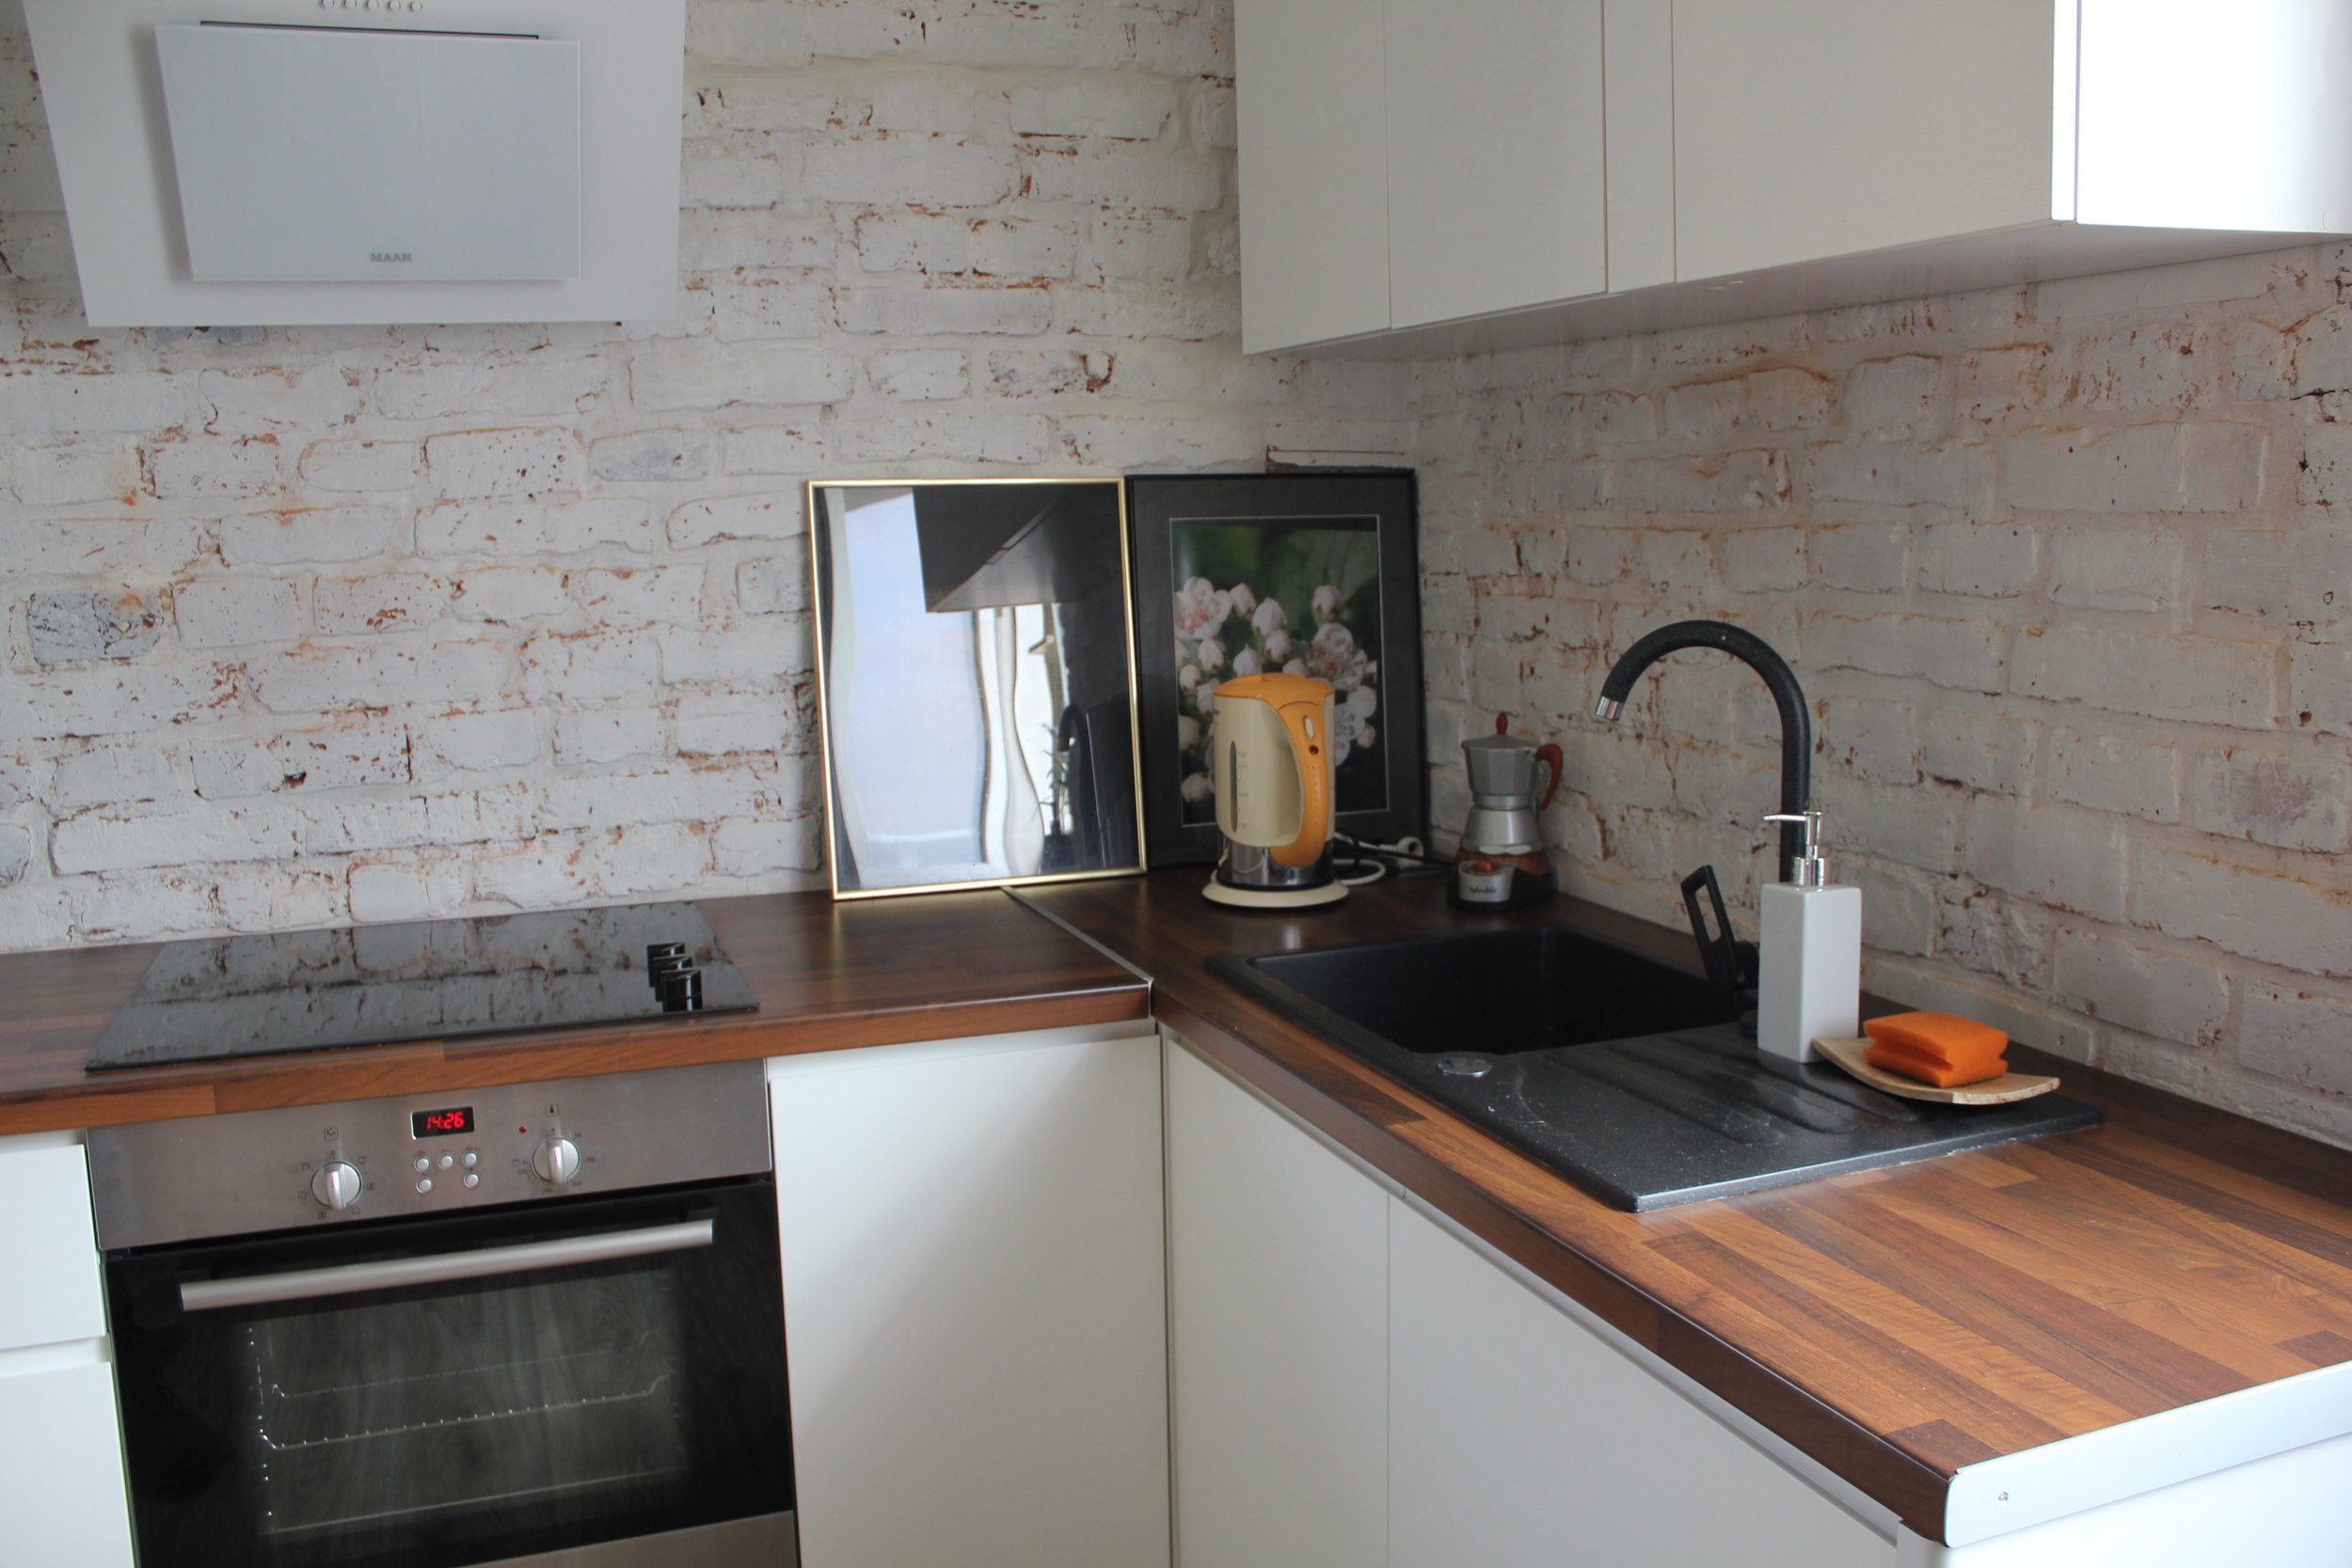 Apartament na Mariensztacie – Kitchen